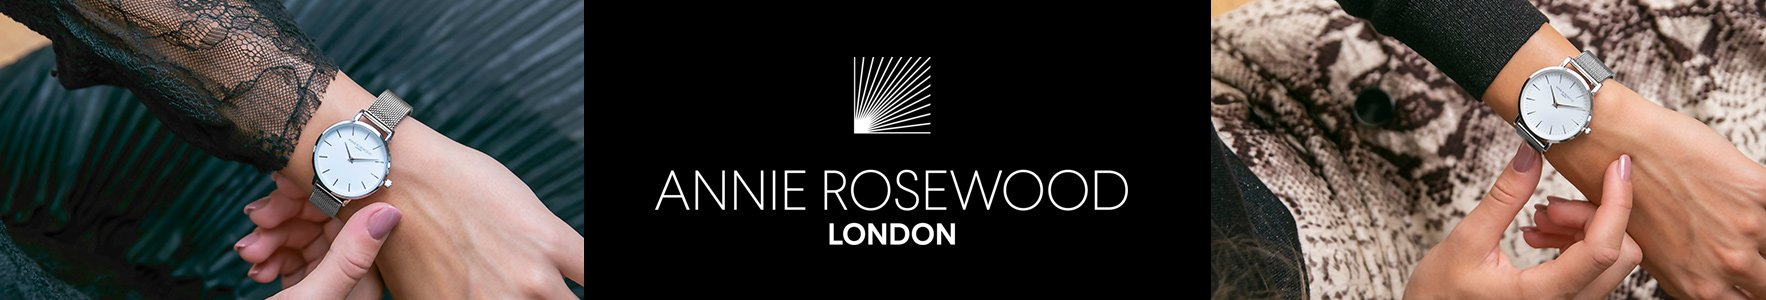 Annie Rosewood